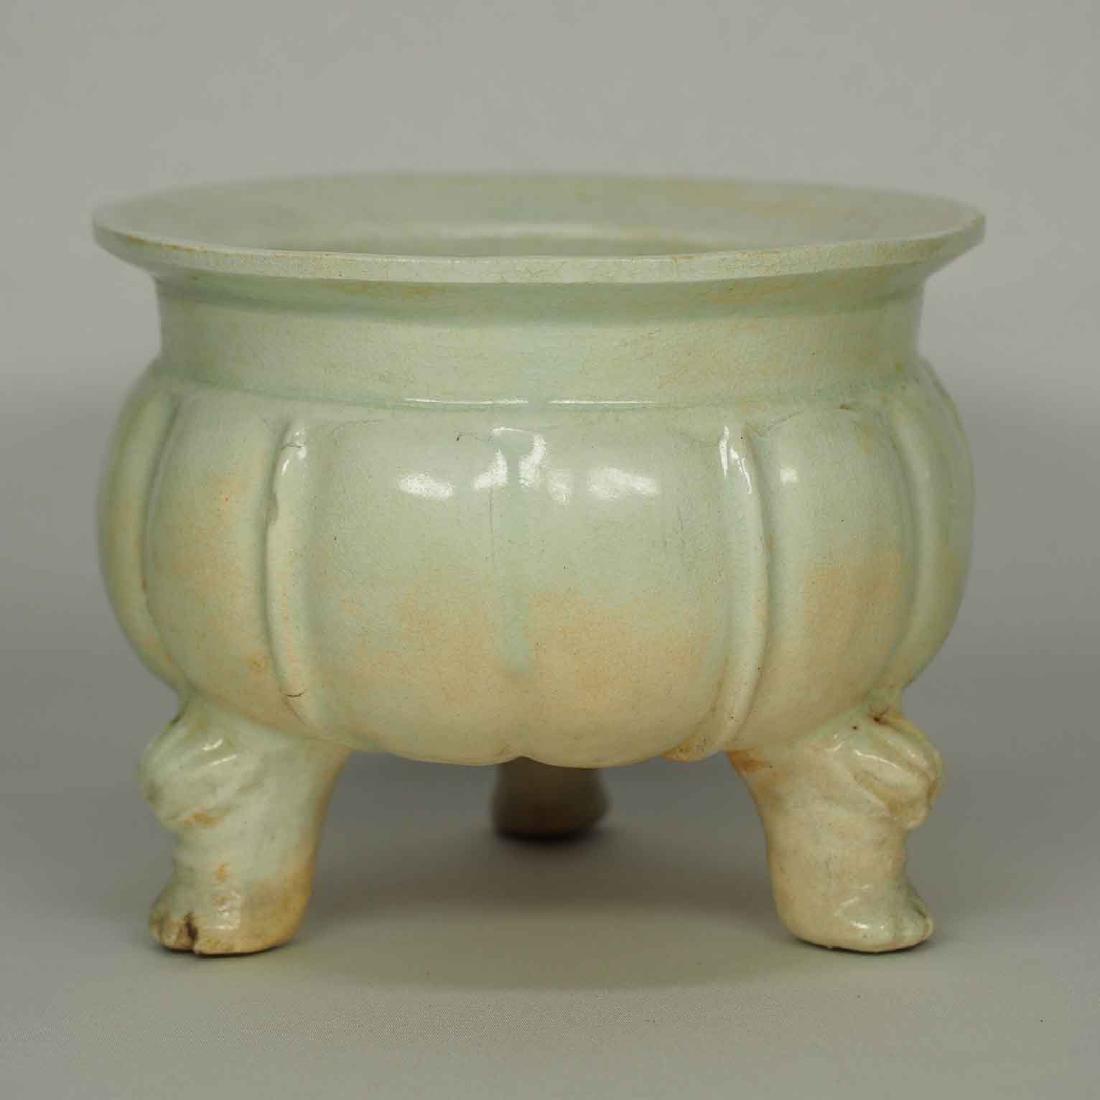 Qingbai Lobbed Tripod Censer, Yuan Dynasty